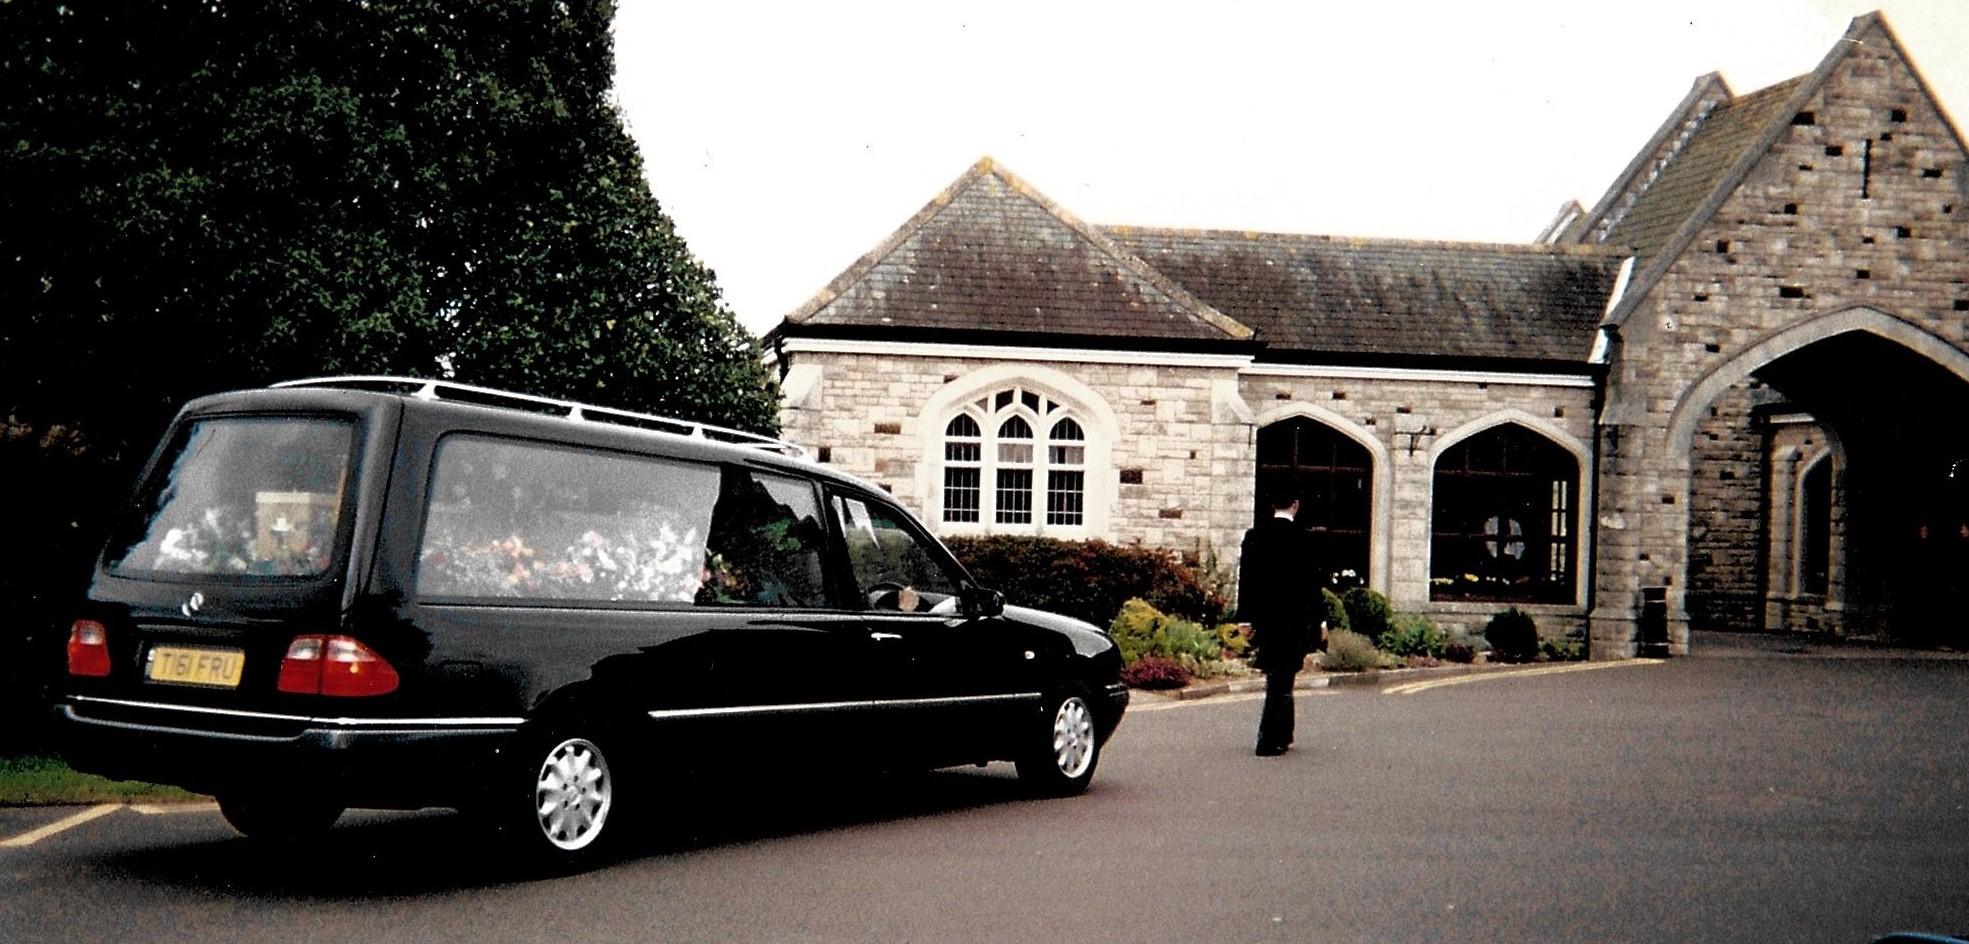 George Scott Funeral Directors procession